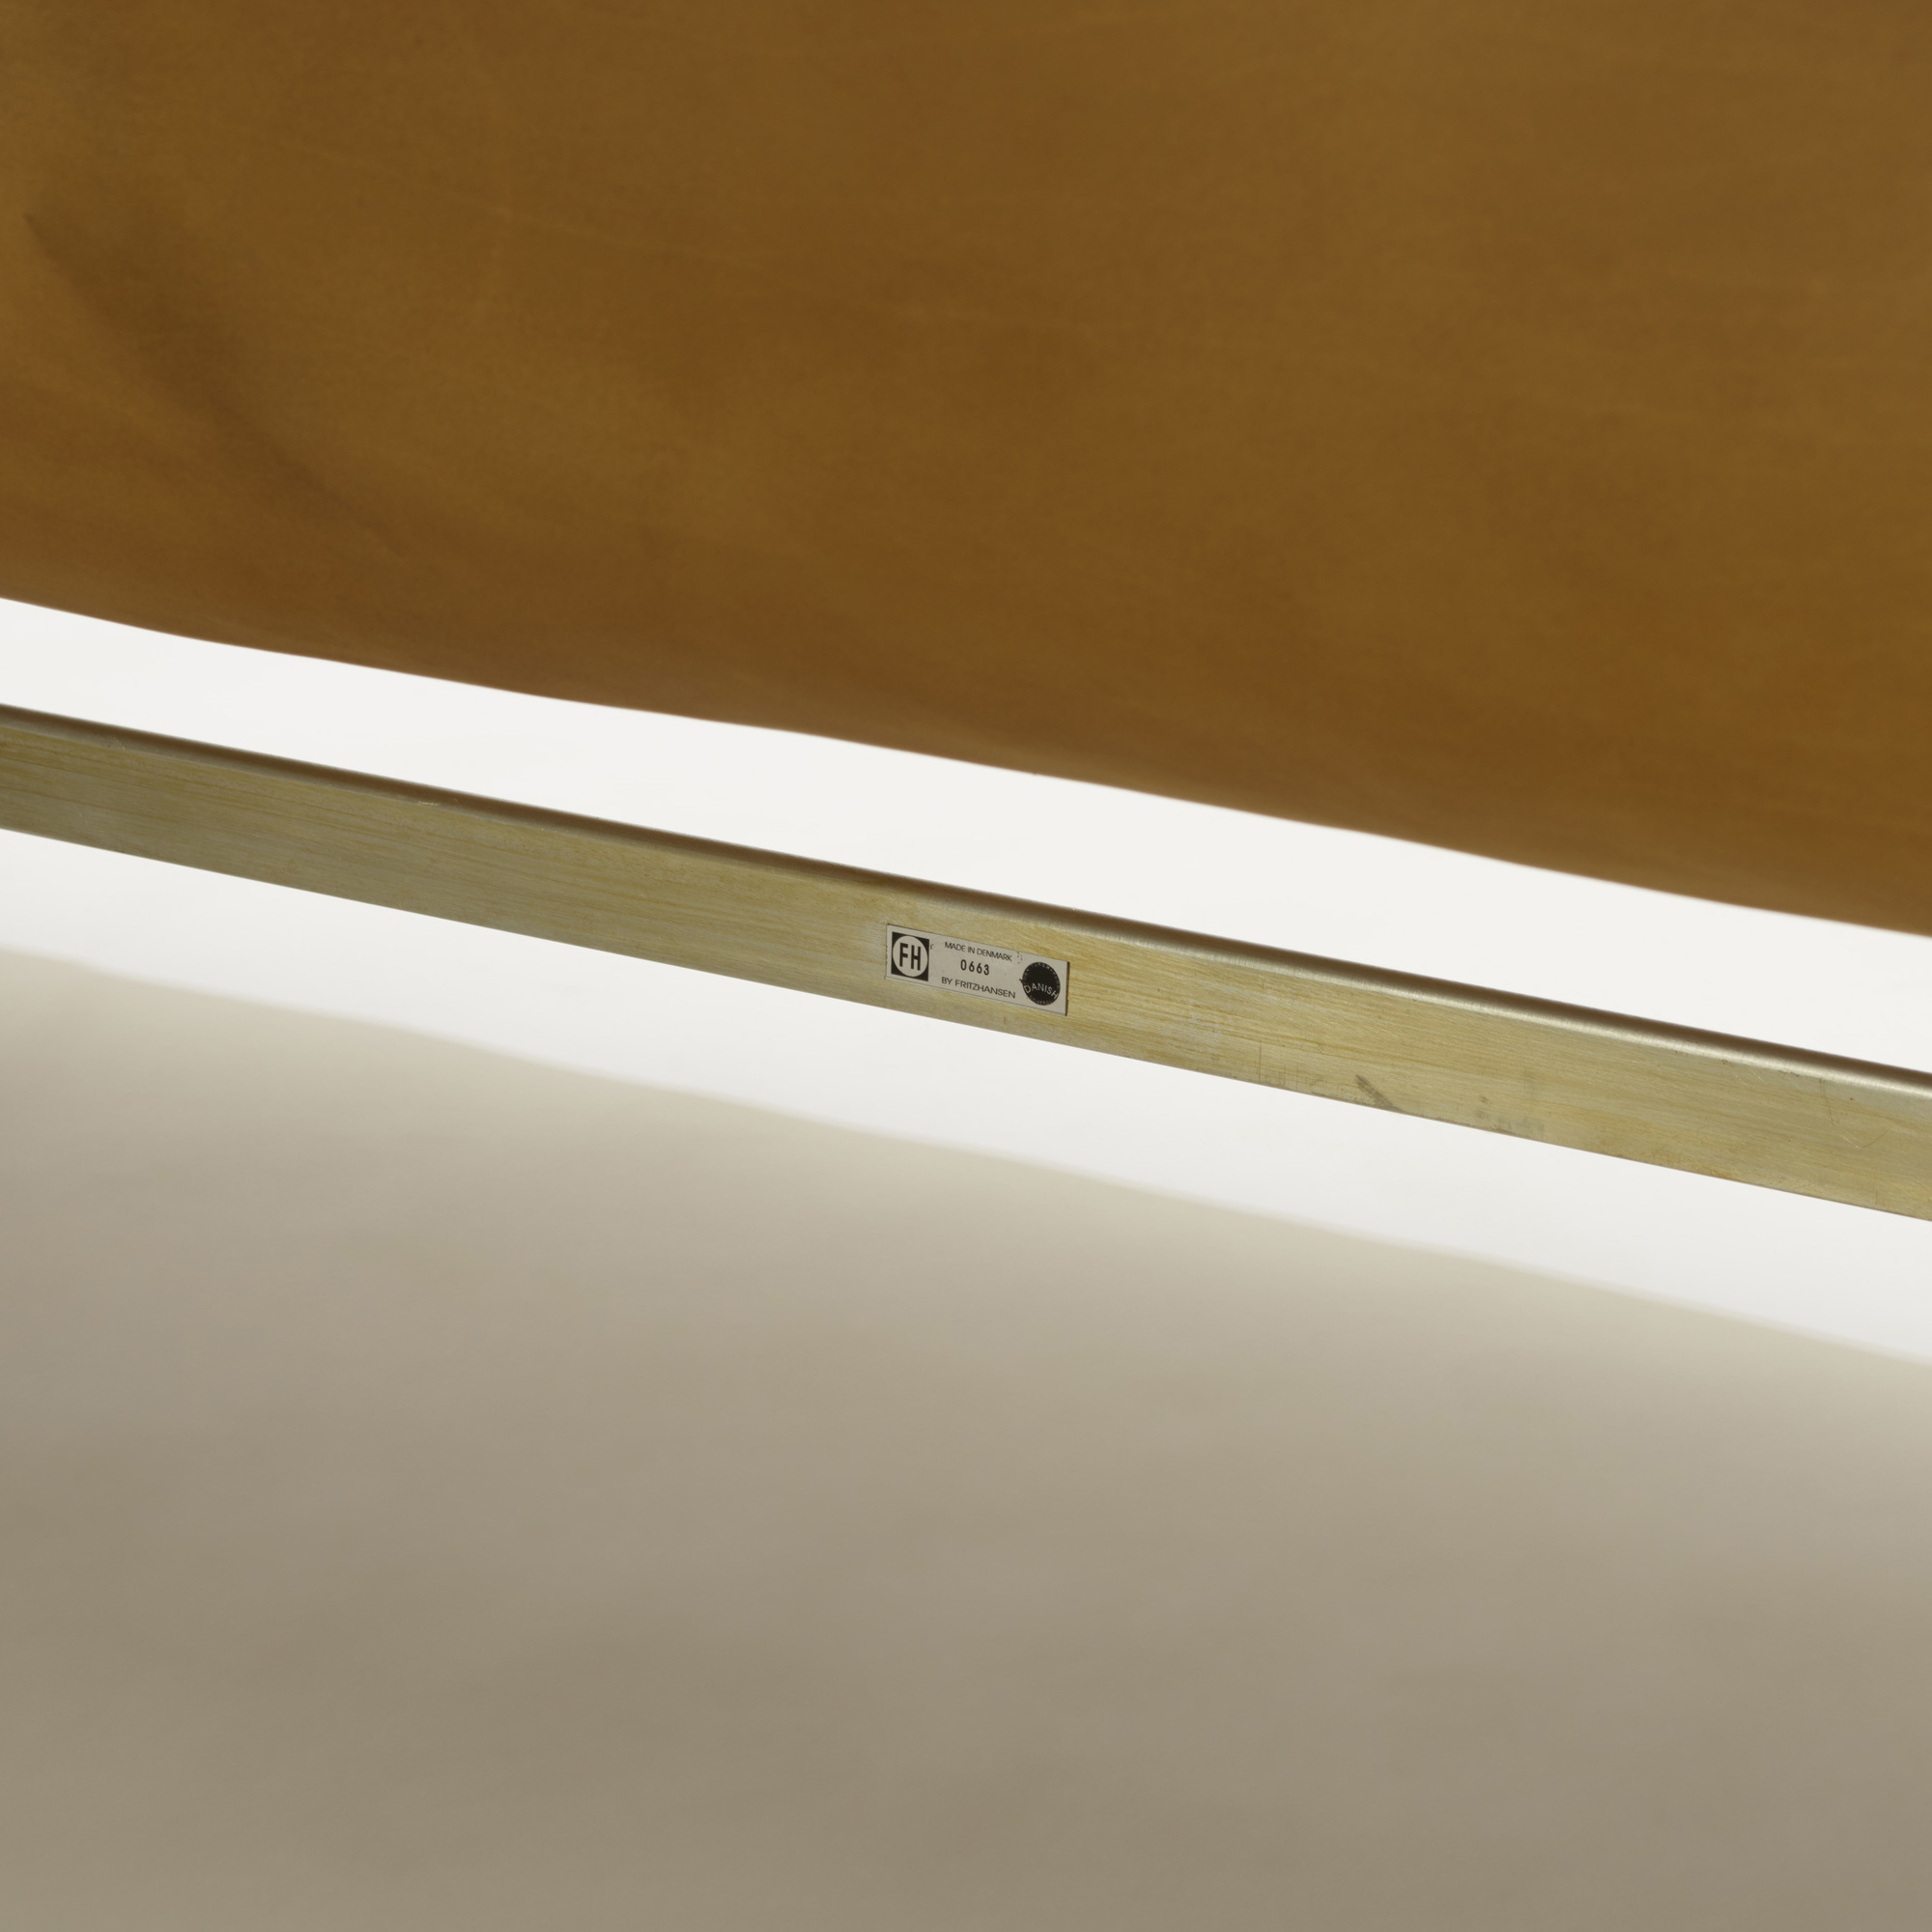 106: Arne Jacobsen / Swan settee, model 3321 (5 of 5)